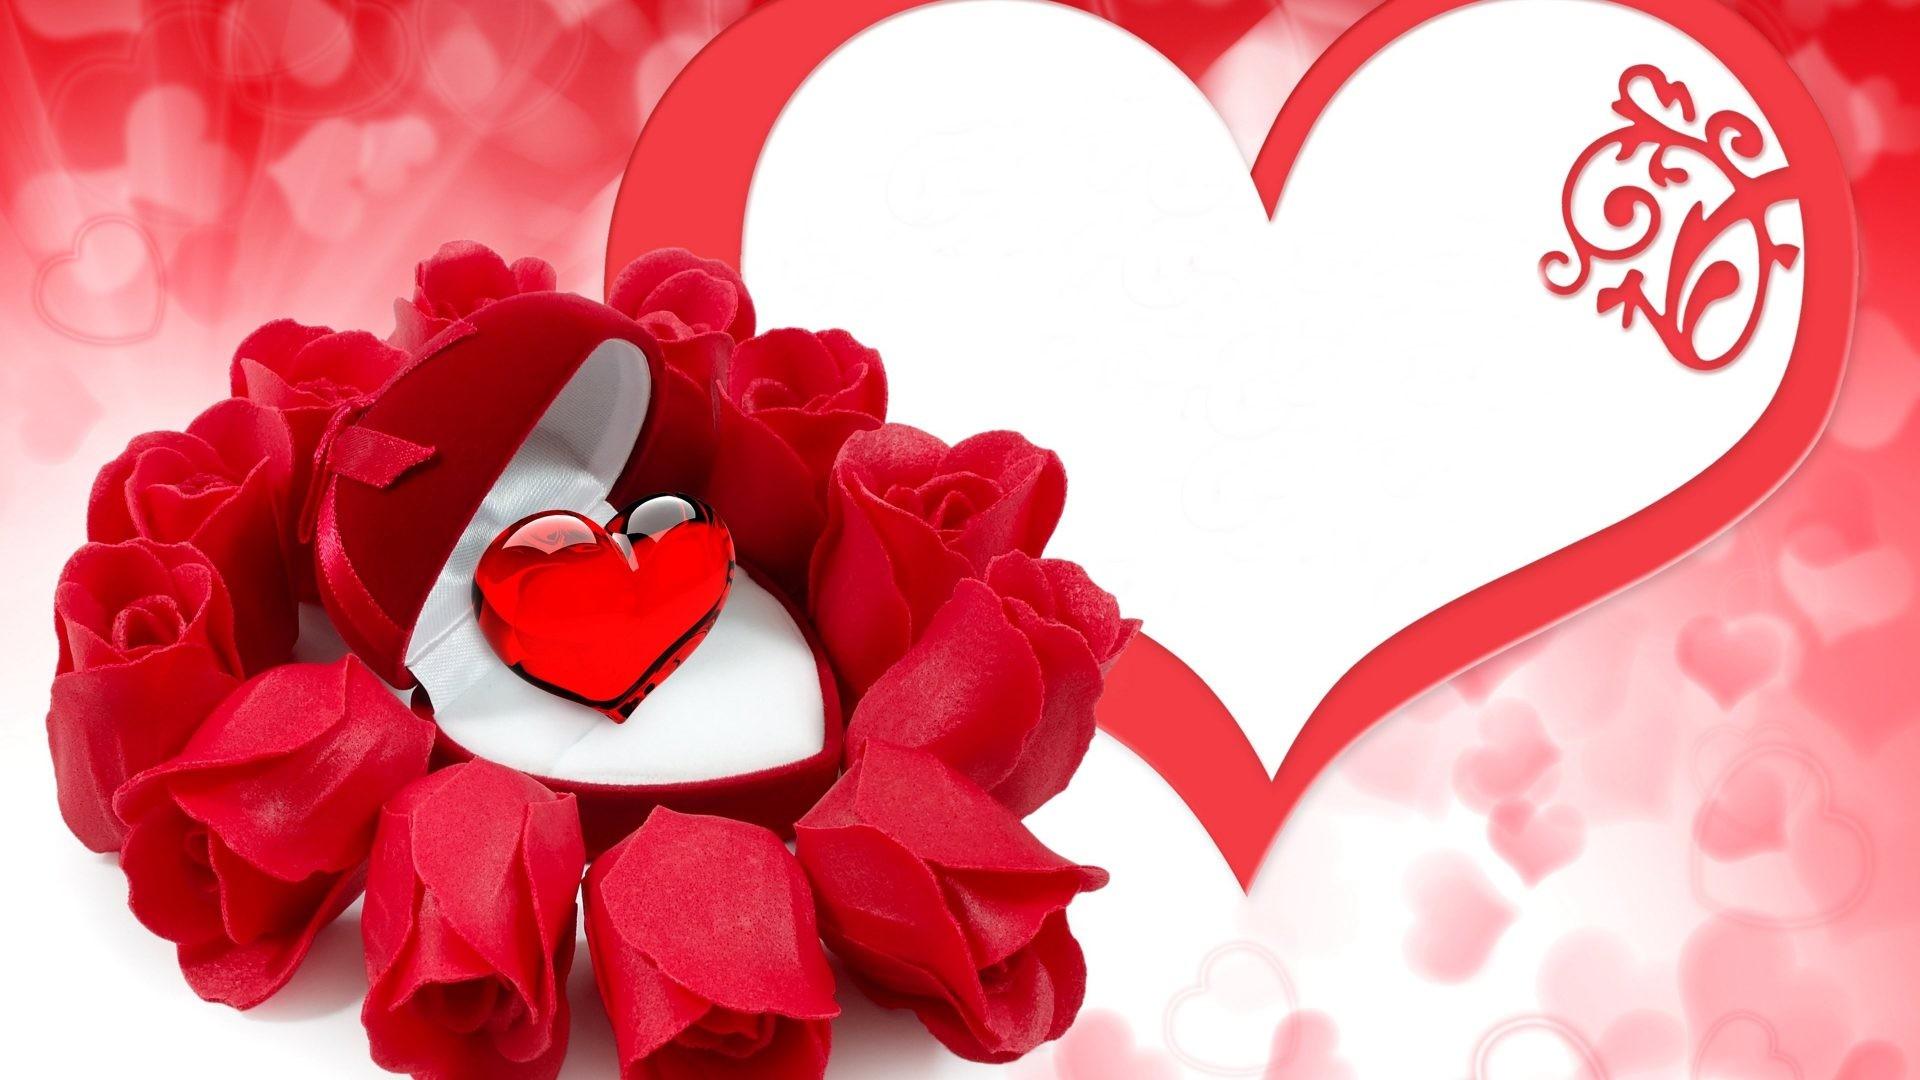 Love flower wallpaper mobile izmirmasajfo